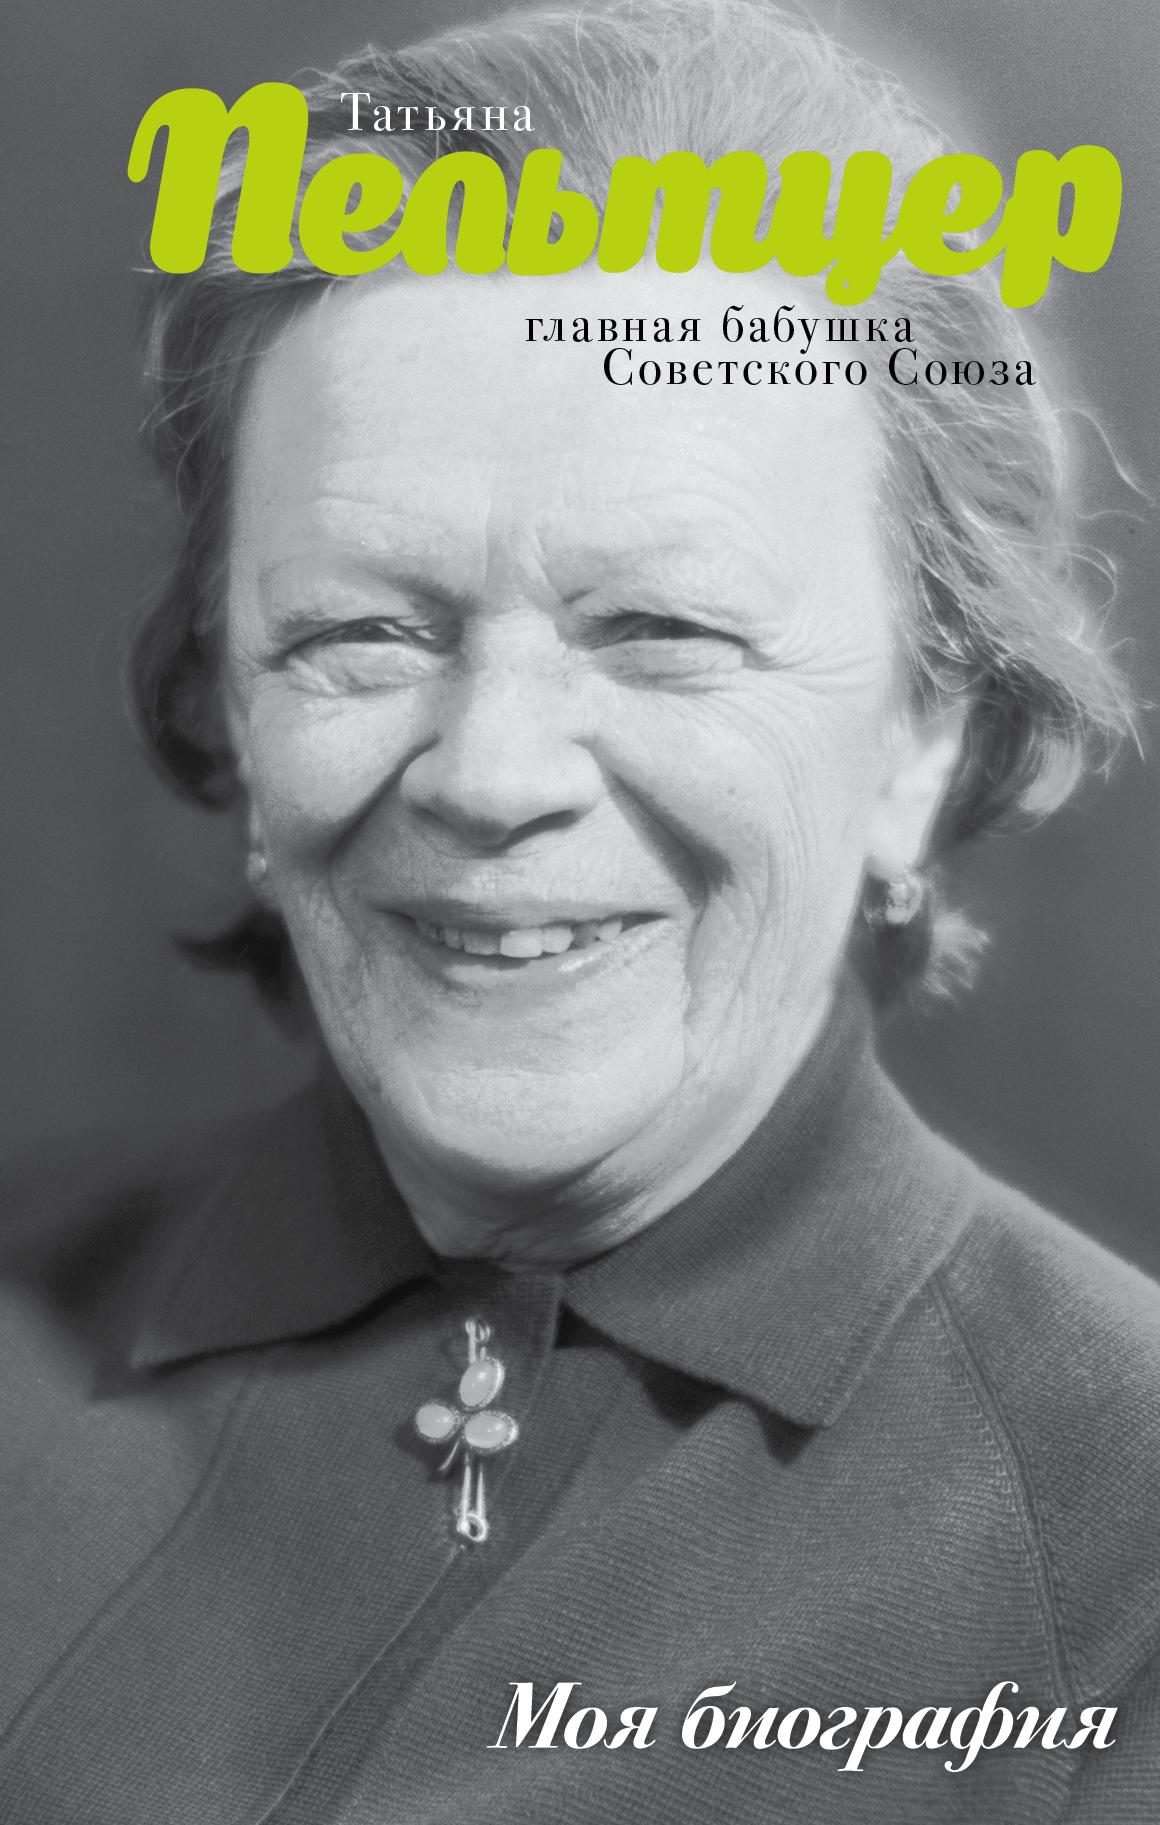 Шляхов А. Л. Татьяна Пельтцер. Главная бабушка Советского Союза